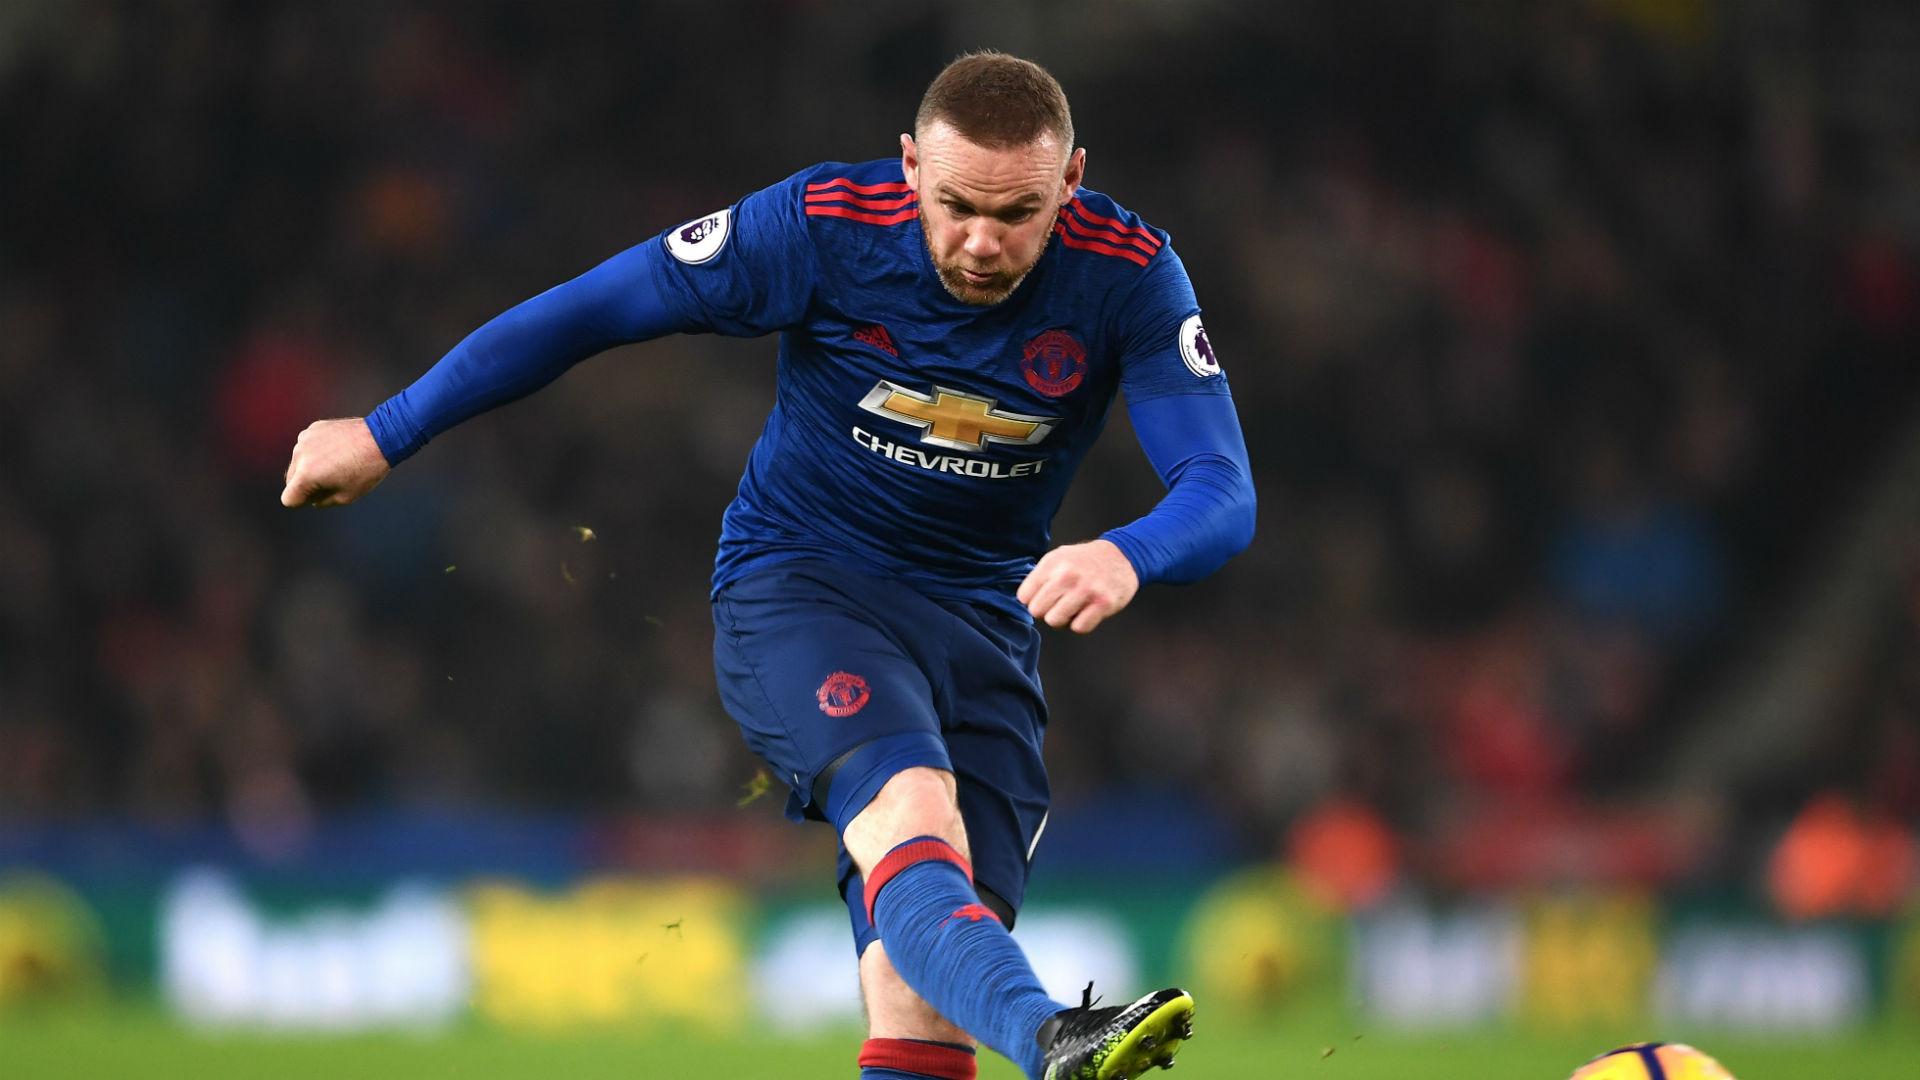 Angleterre : Rooney sauve Manchester United avec son 250e but